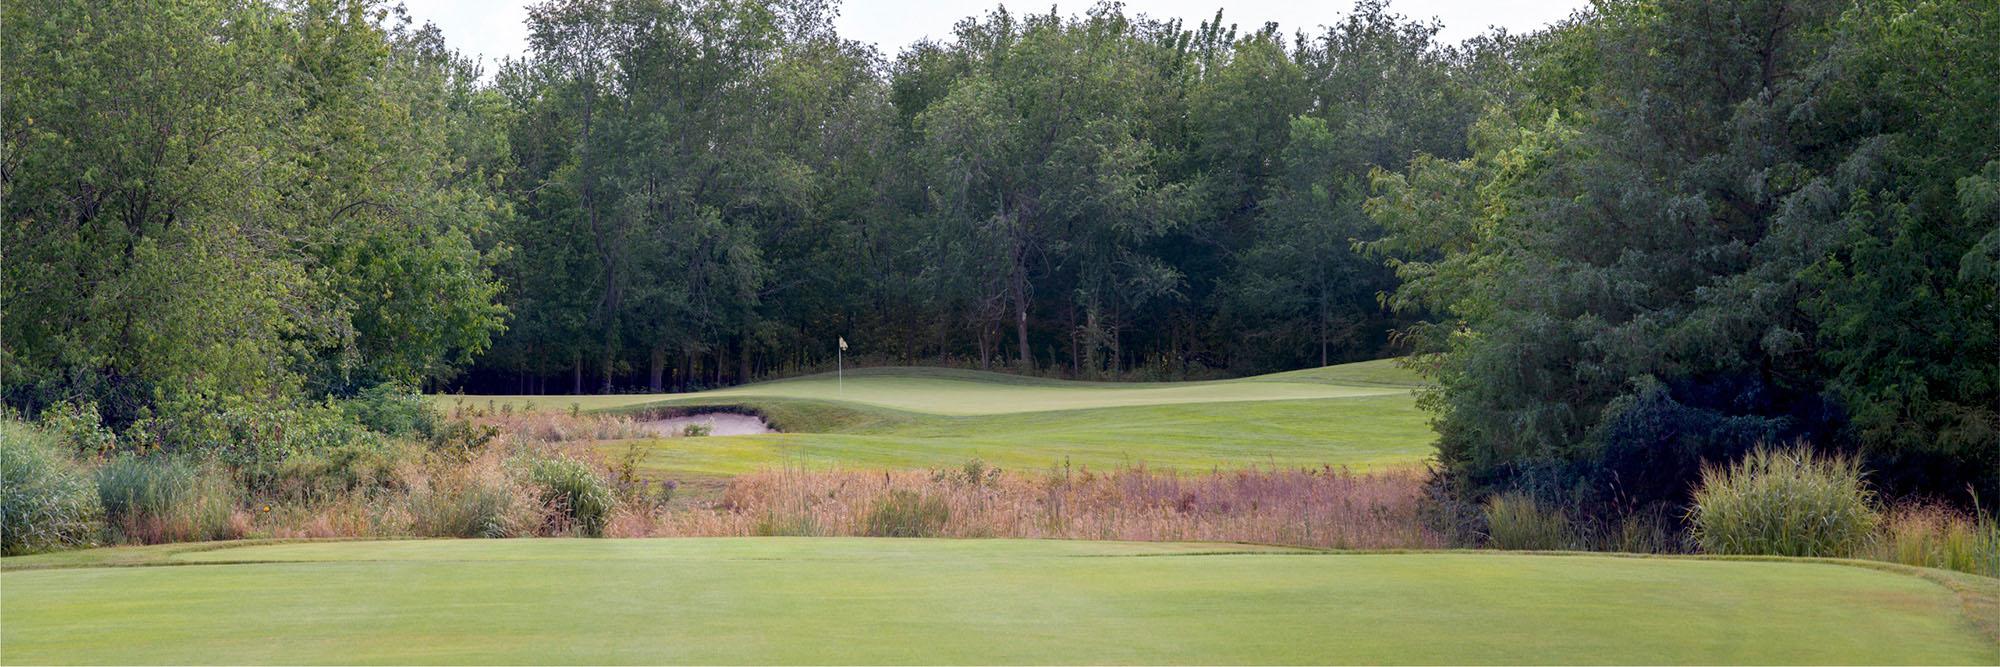 Golf Course Image - Flint Hills National Golf Club No. 8